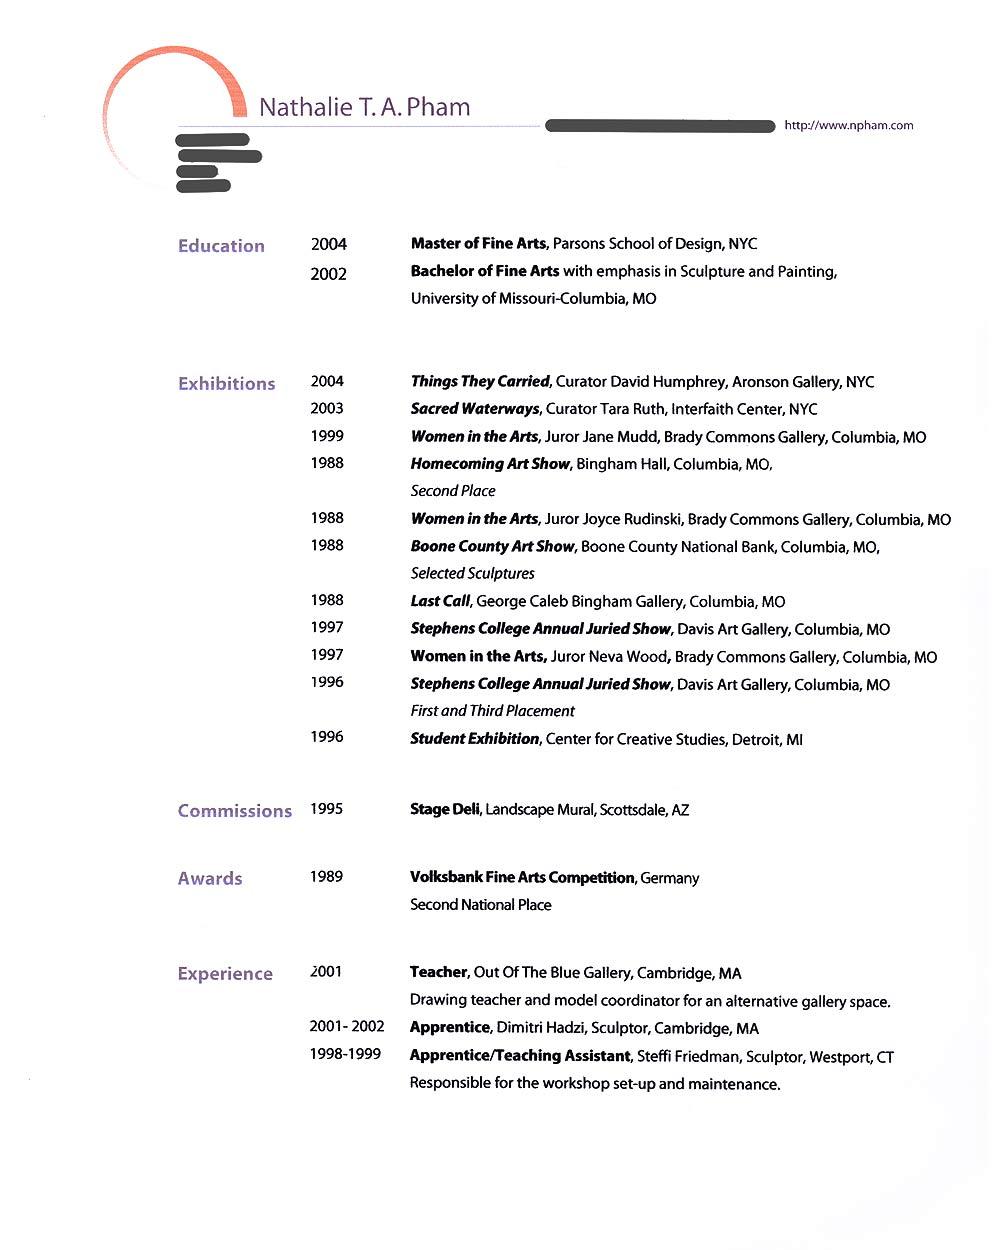 Nathalie Pham's Resume